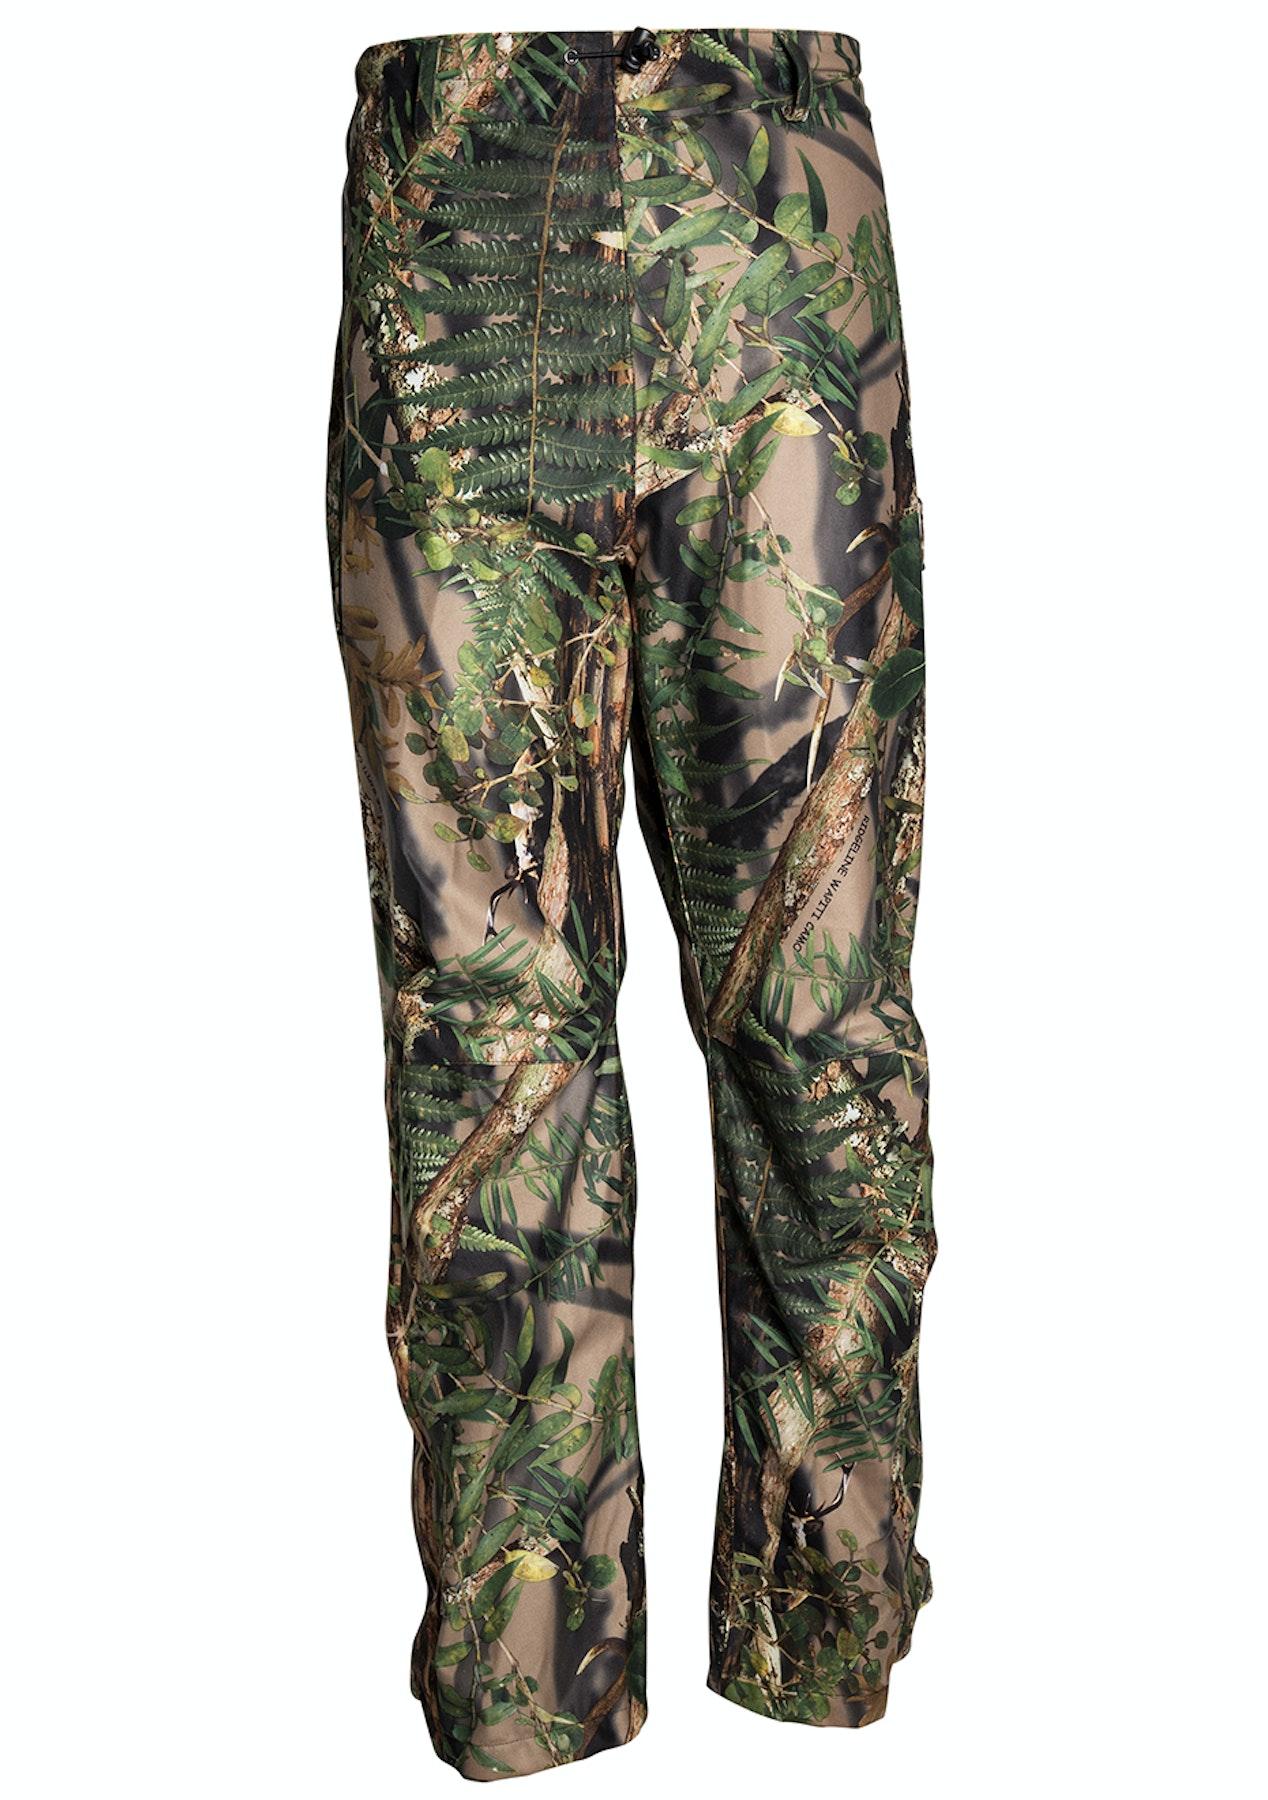 7ade40ee9 Ridgeline - Mallard Waterproof Pants - Mens - Wapiti Camo